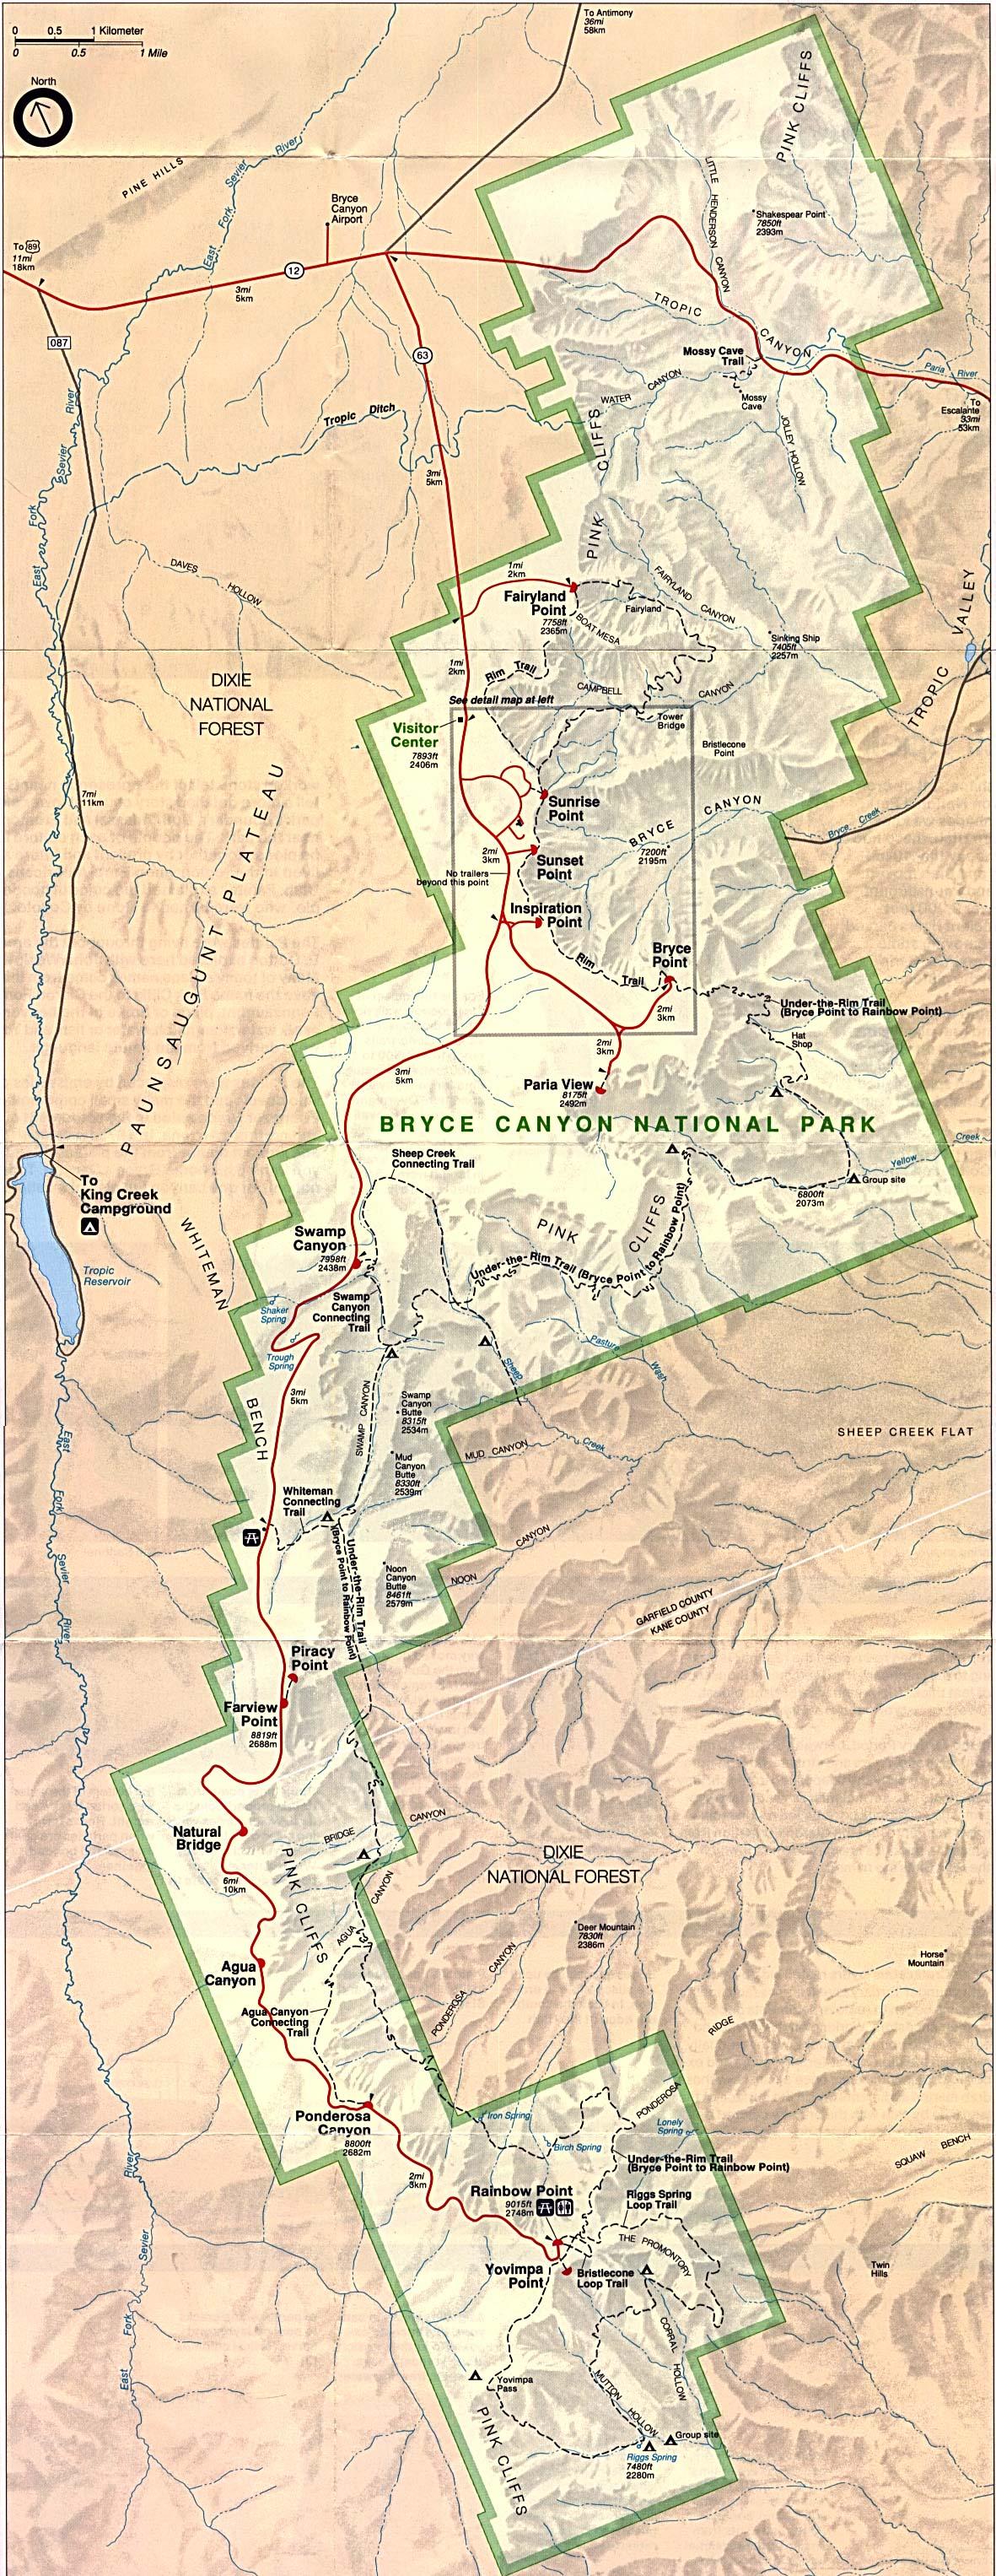 Bryce Canyon National Park Map, Utah, United States